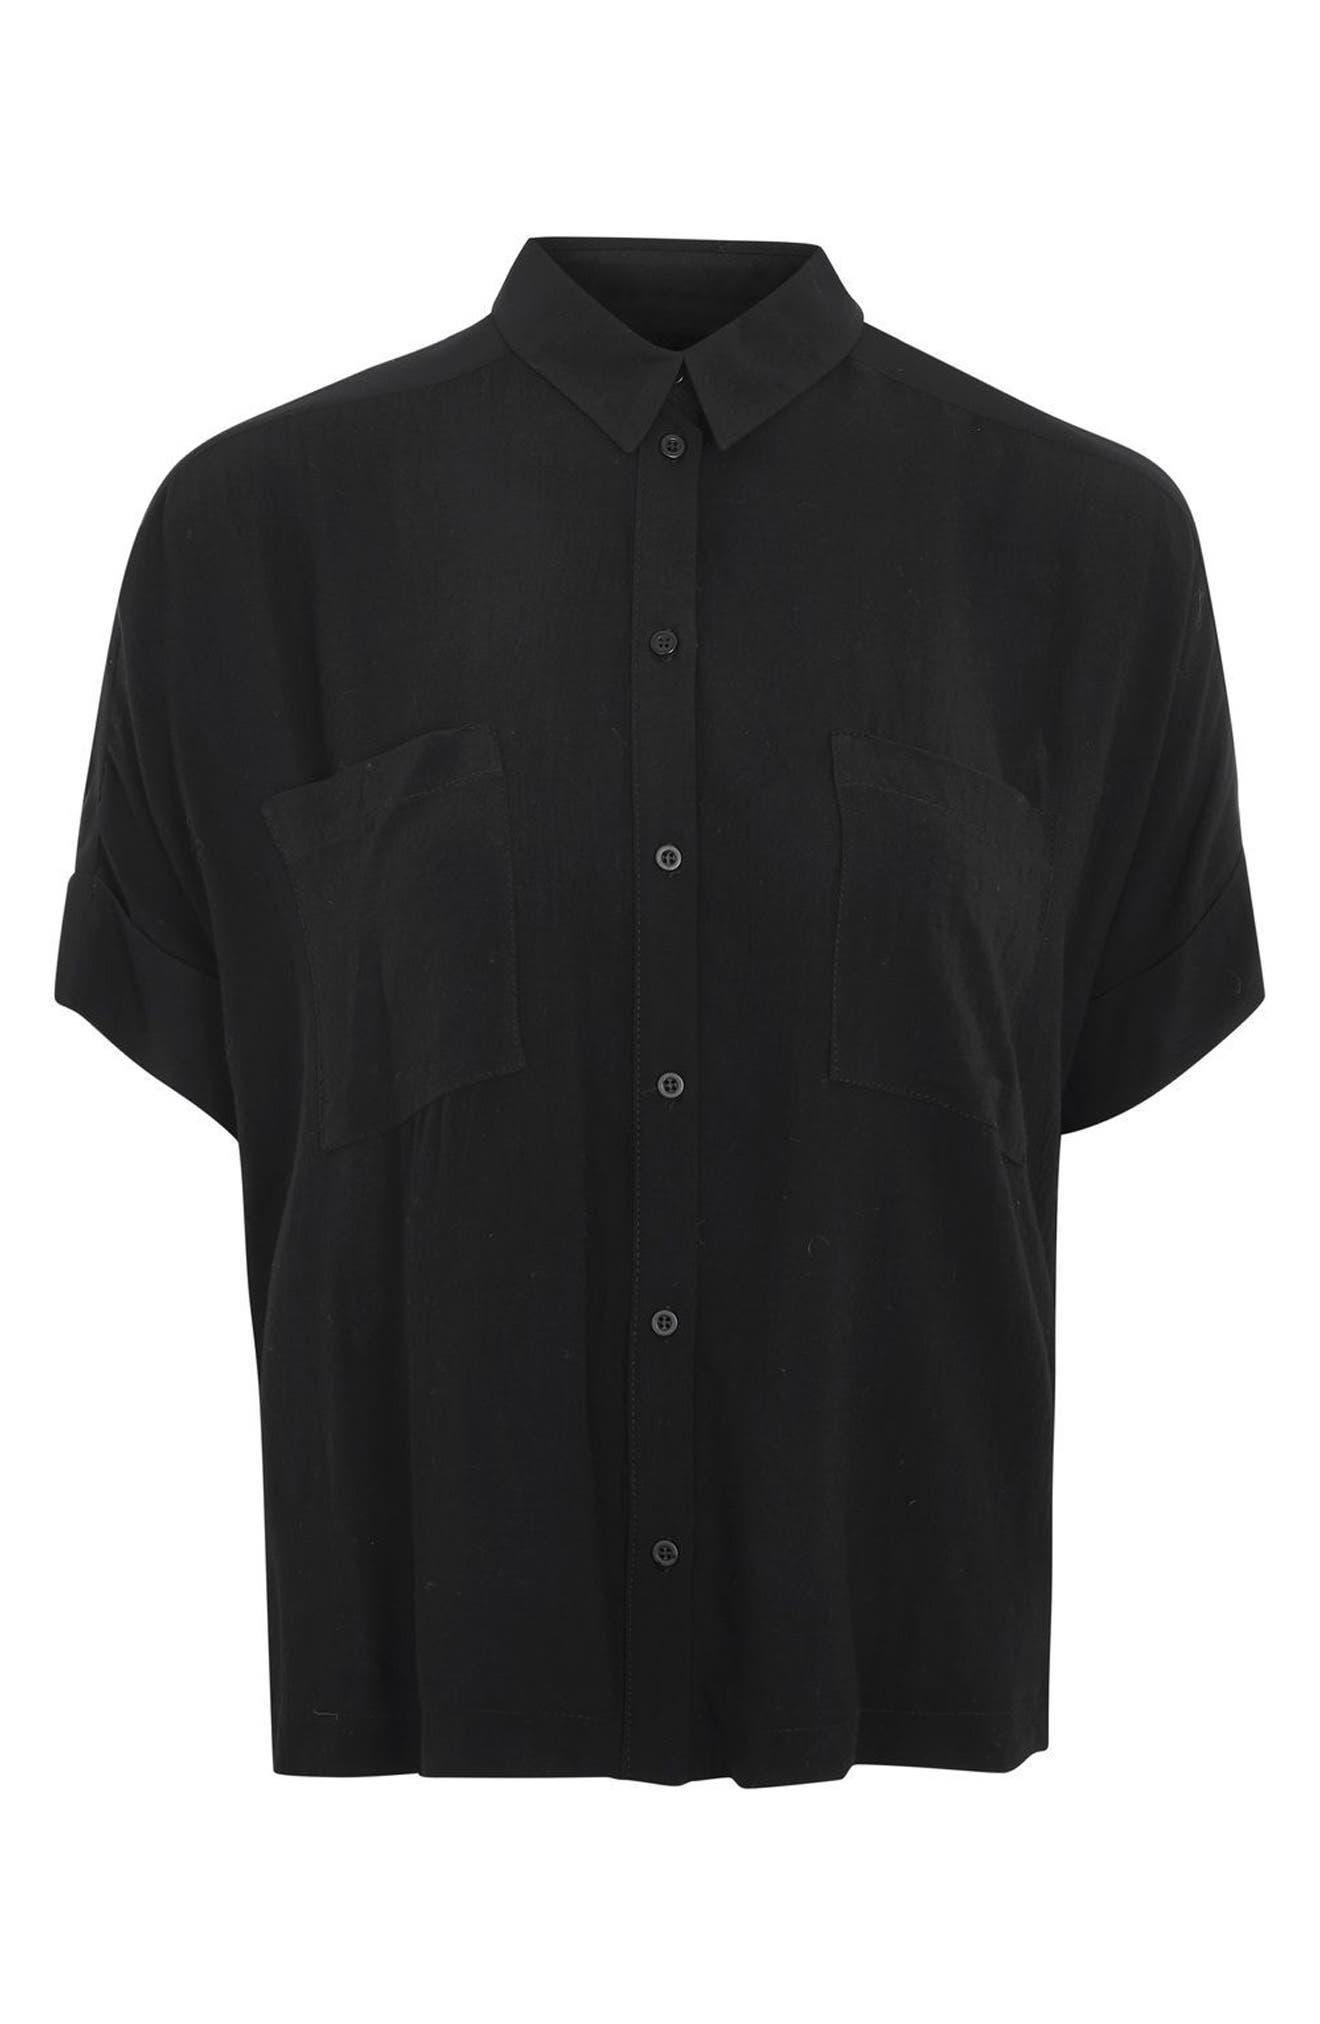 Joey Shirt,                             Alternate thumbnail 4, color,                             Black